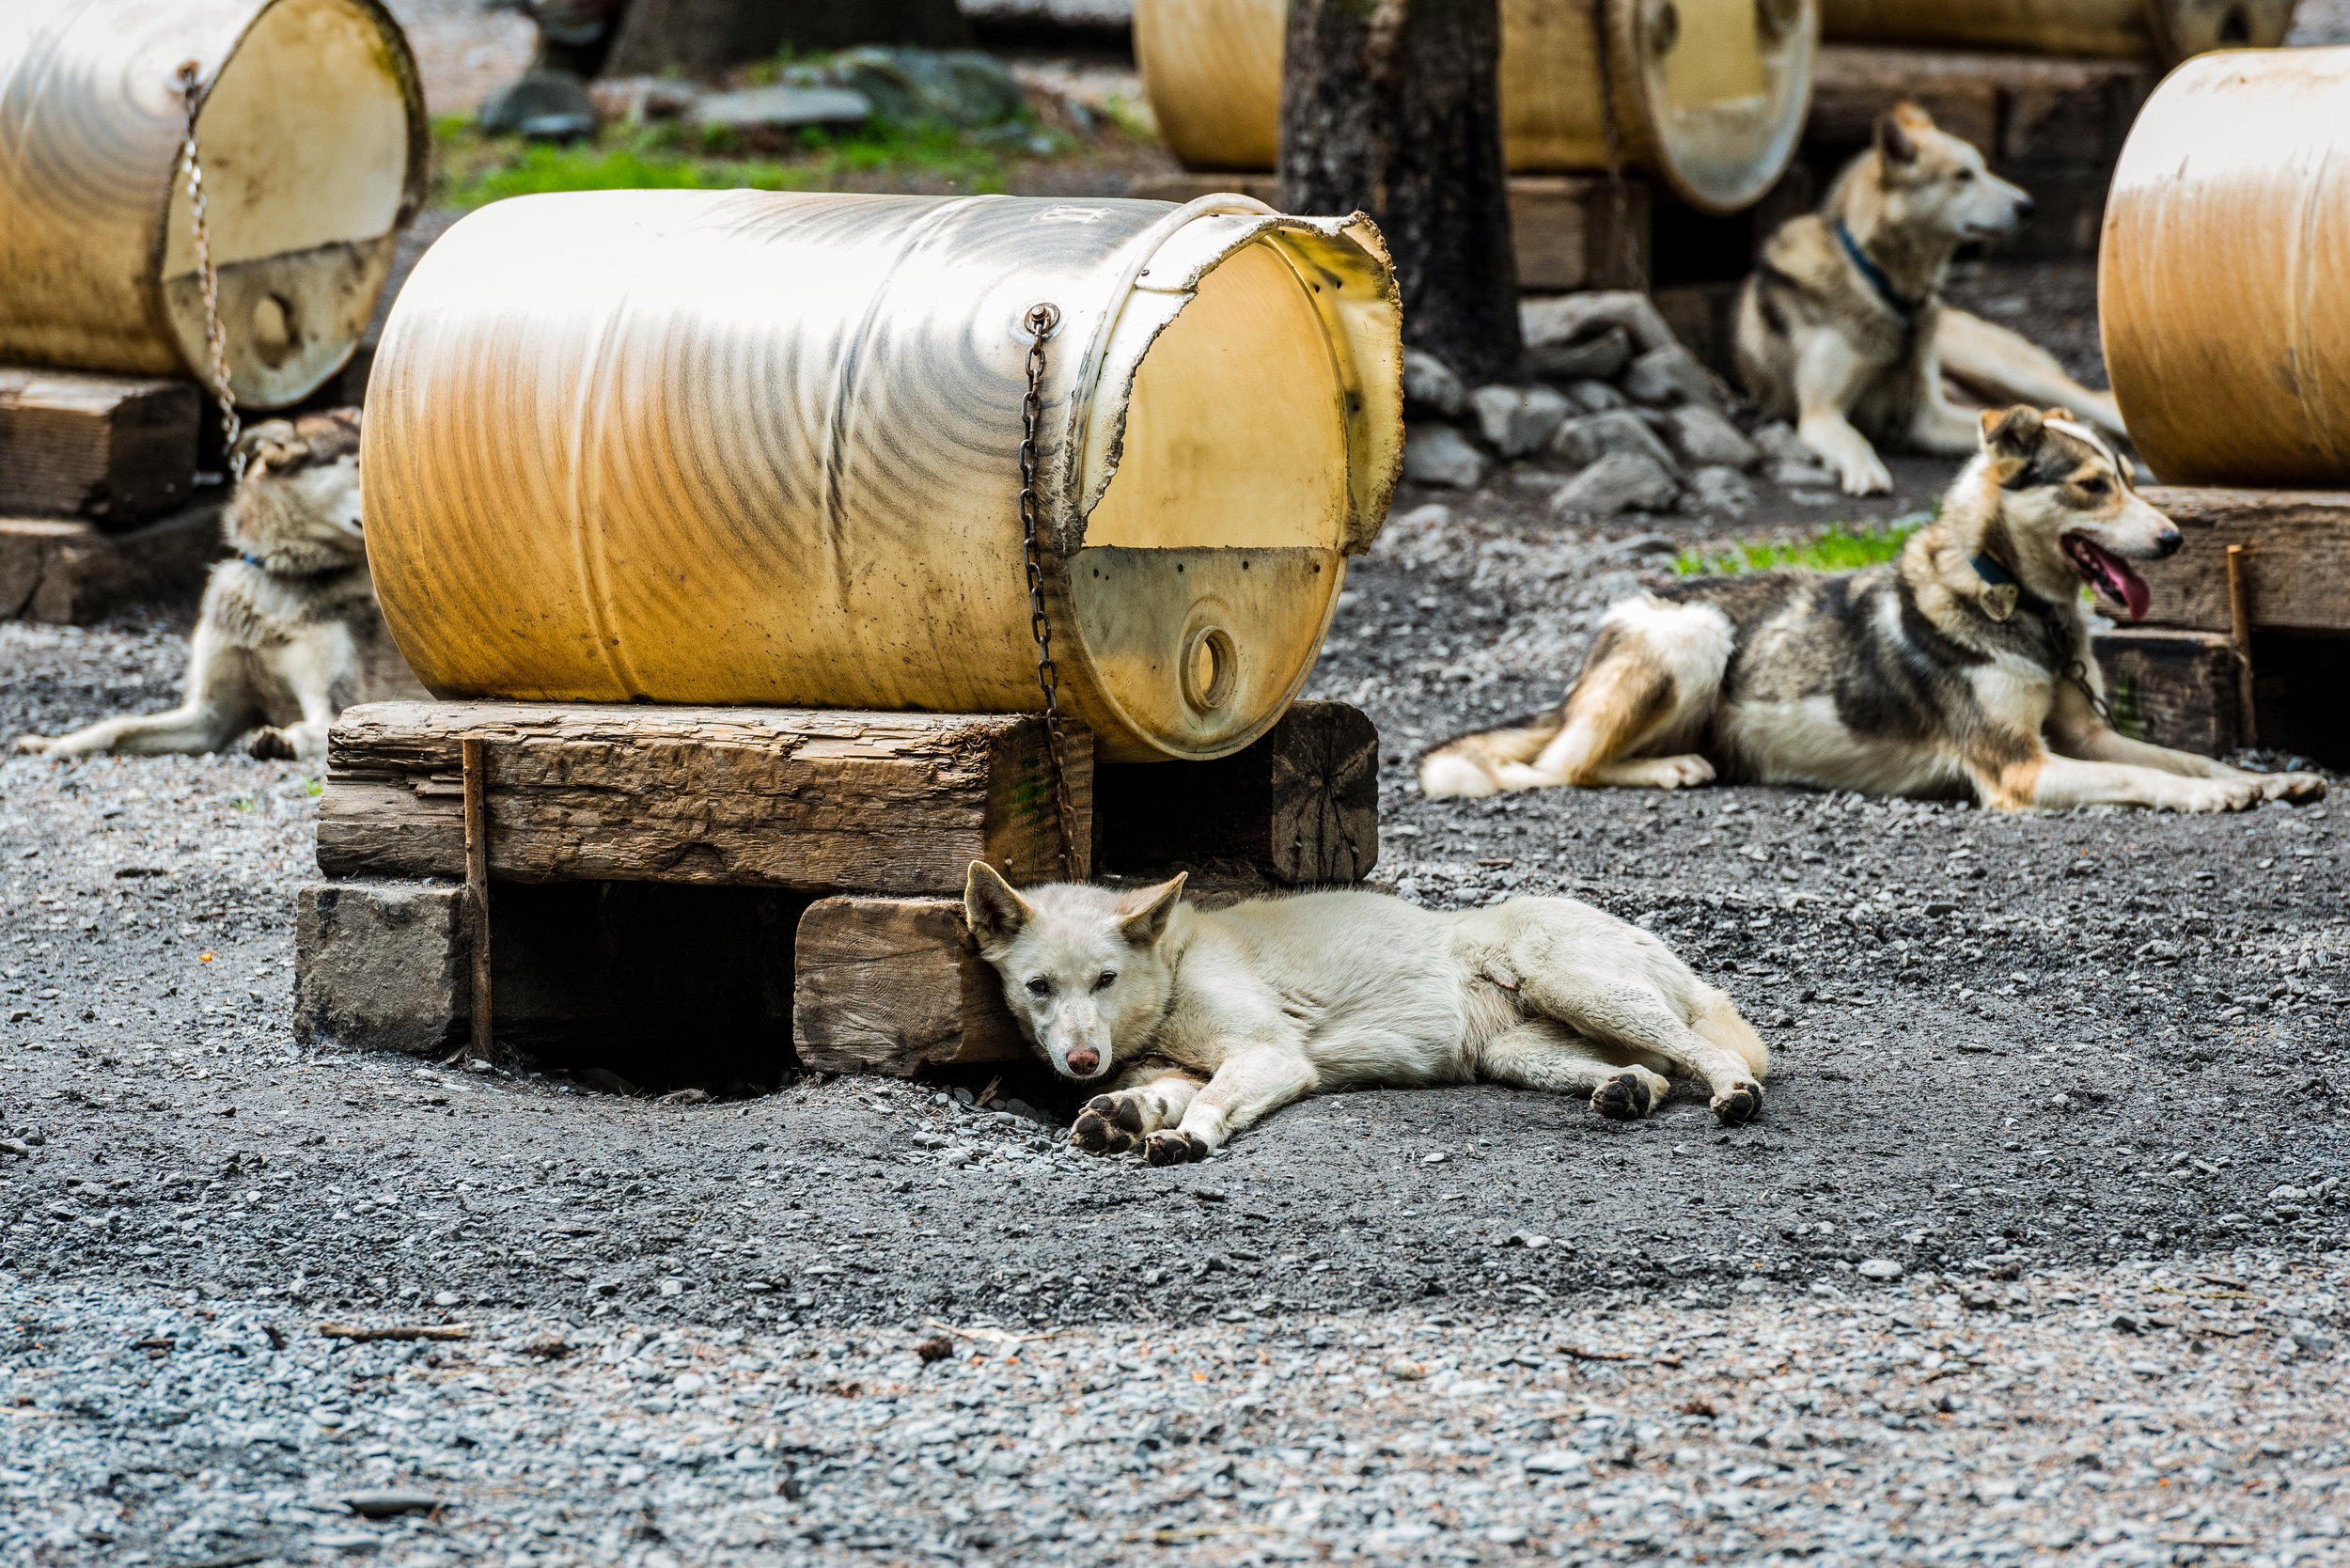 Sled Dogs at Iditadog in Seward, AK